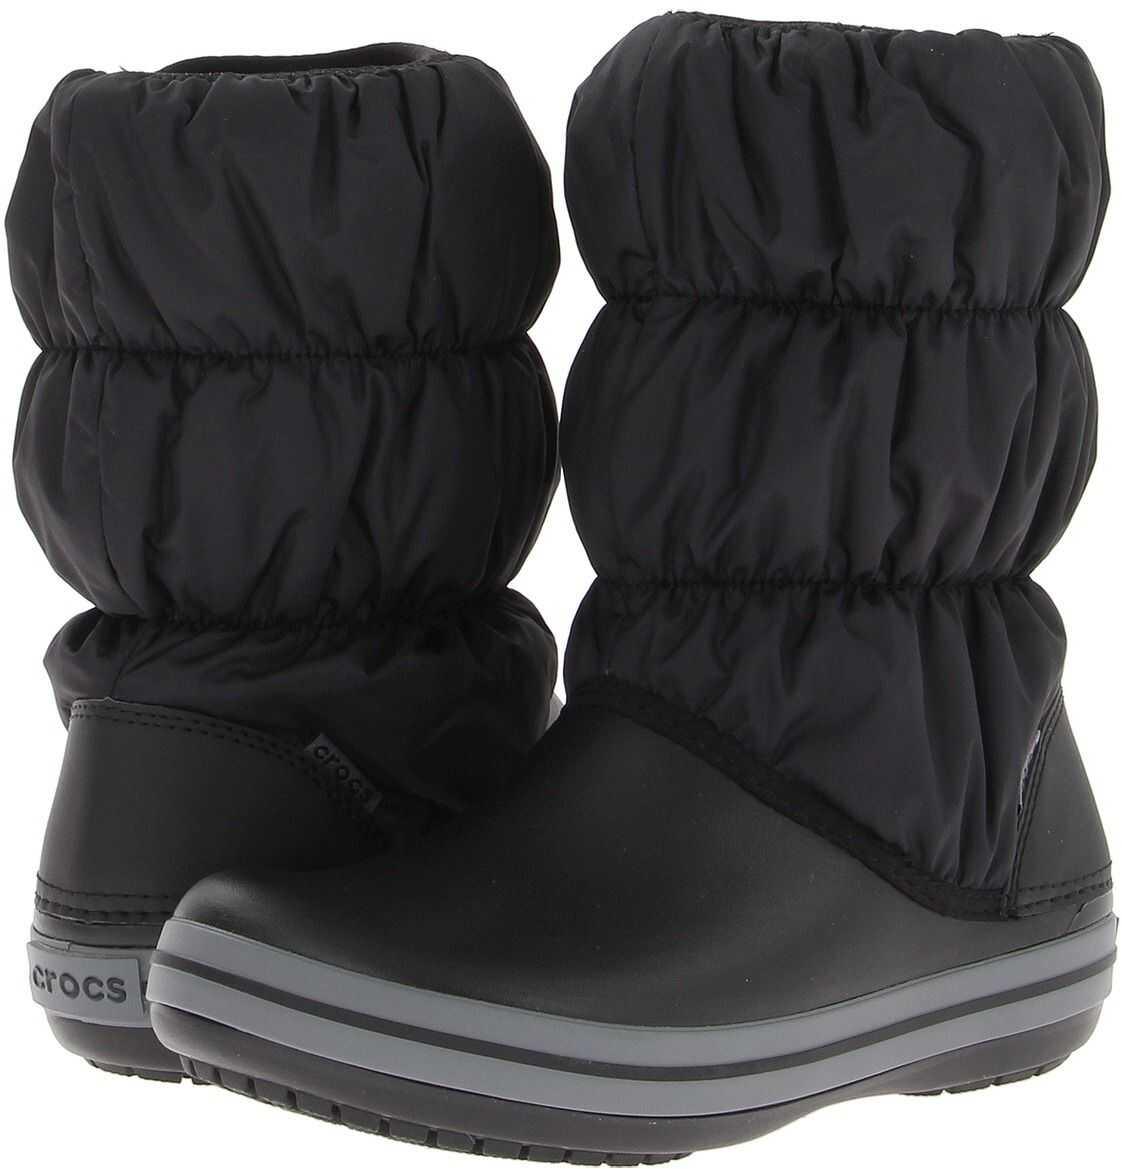 Crocs Winter Puff Boot Black/Charcoal